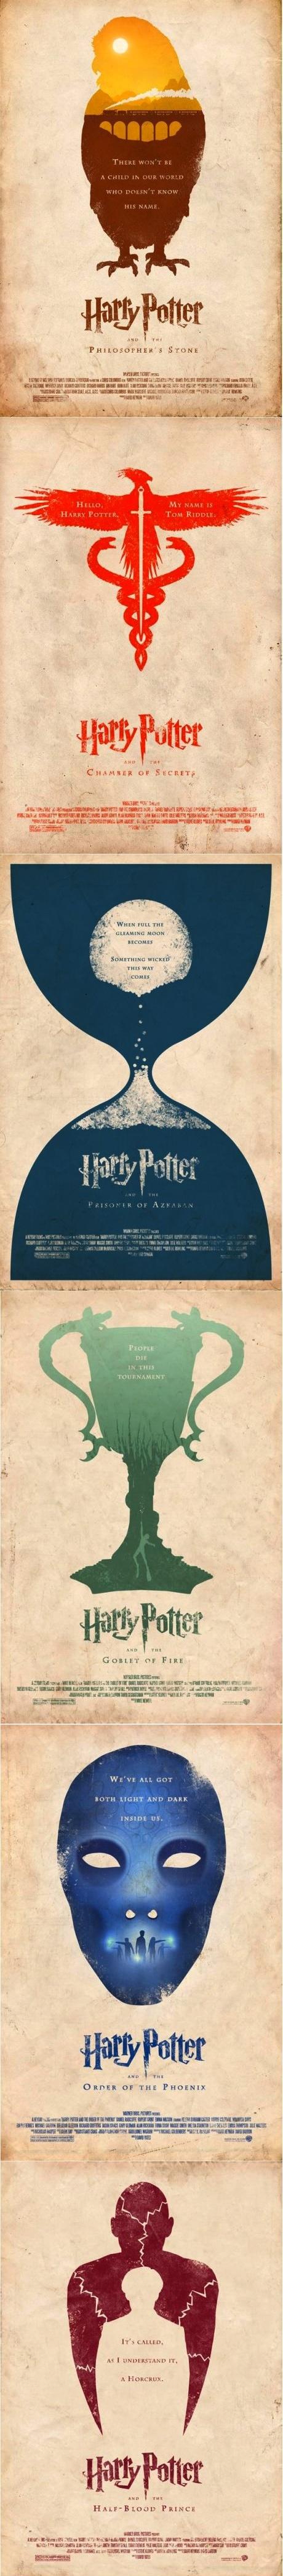 Alternative Harry Potter movie posters